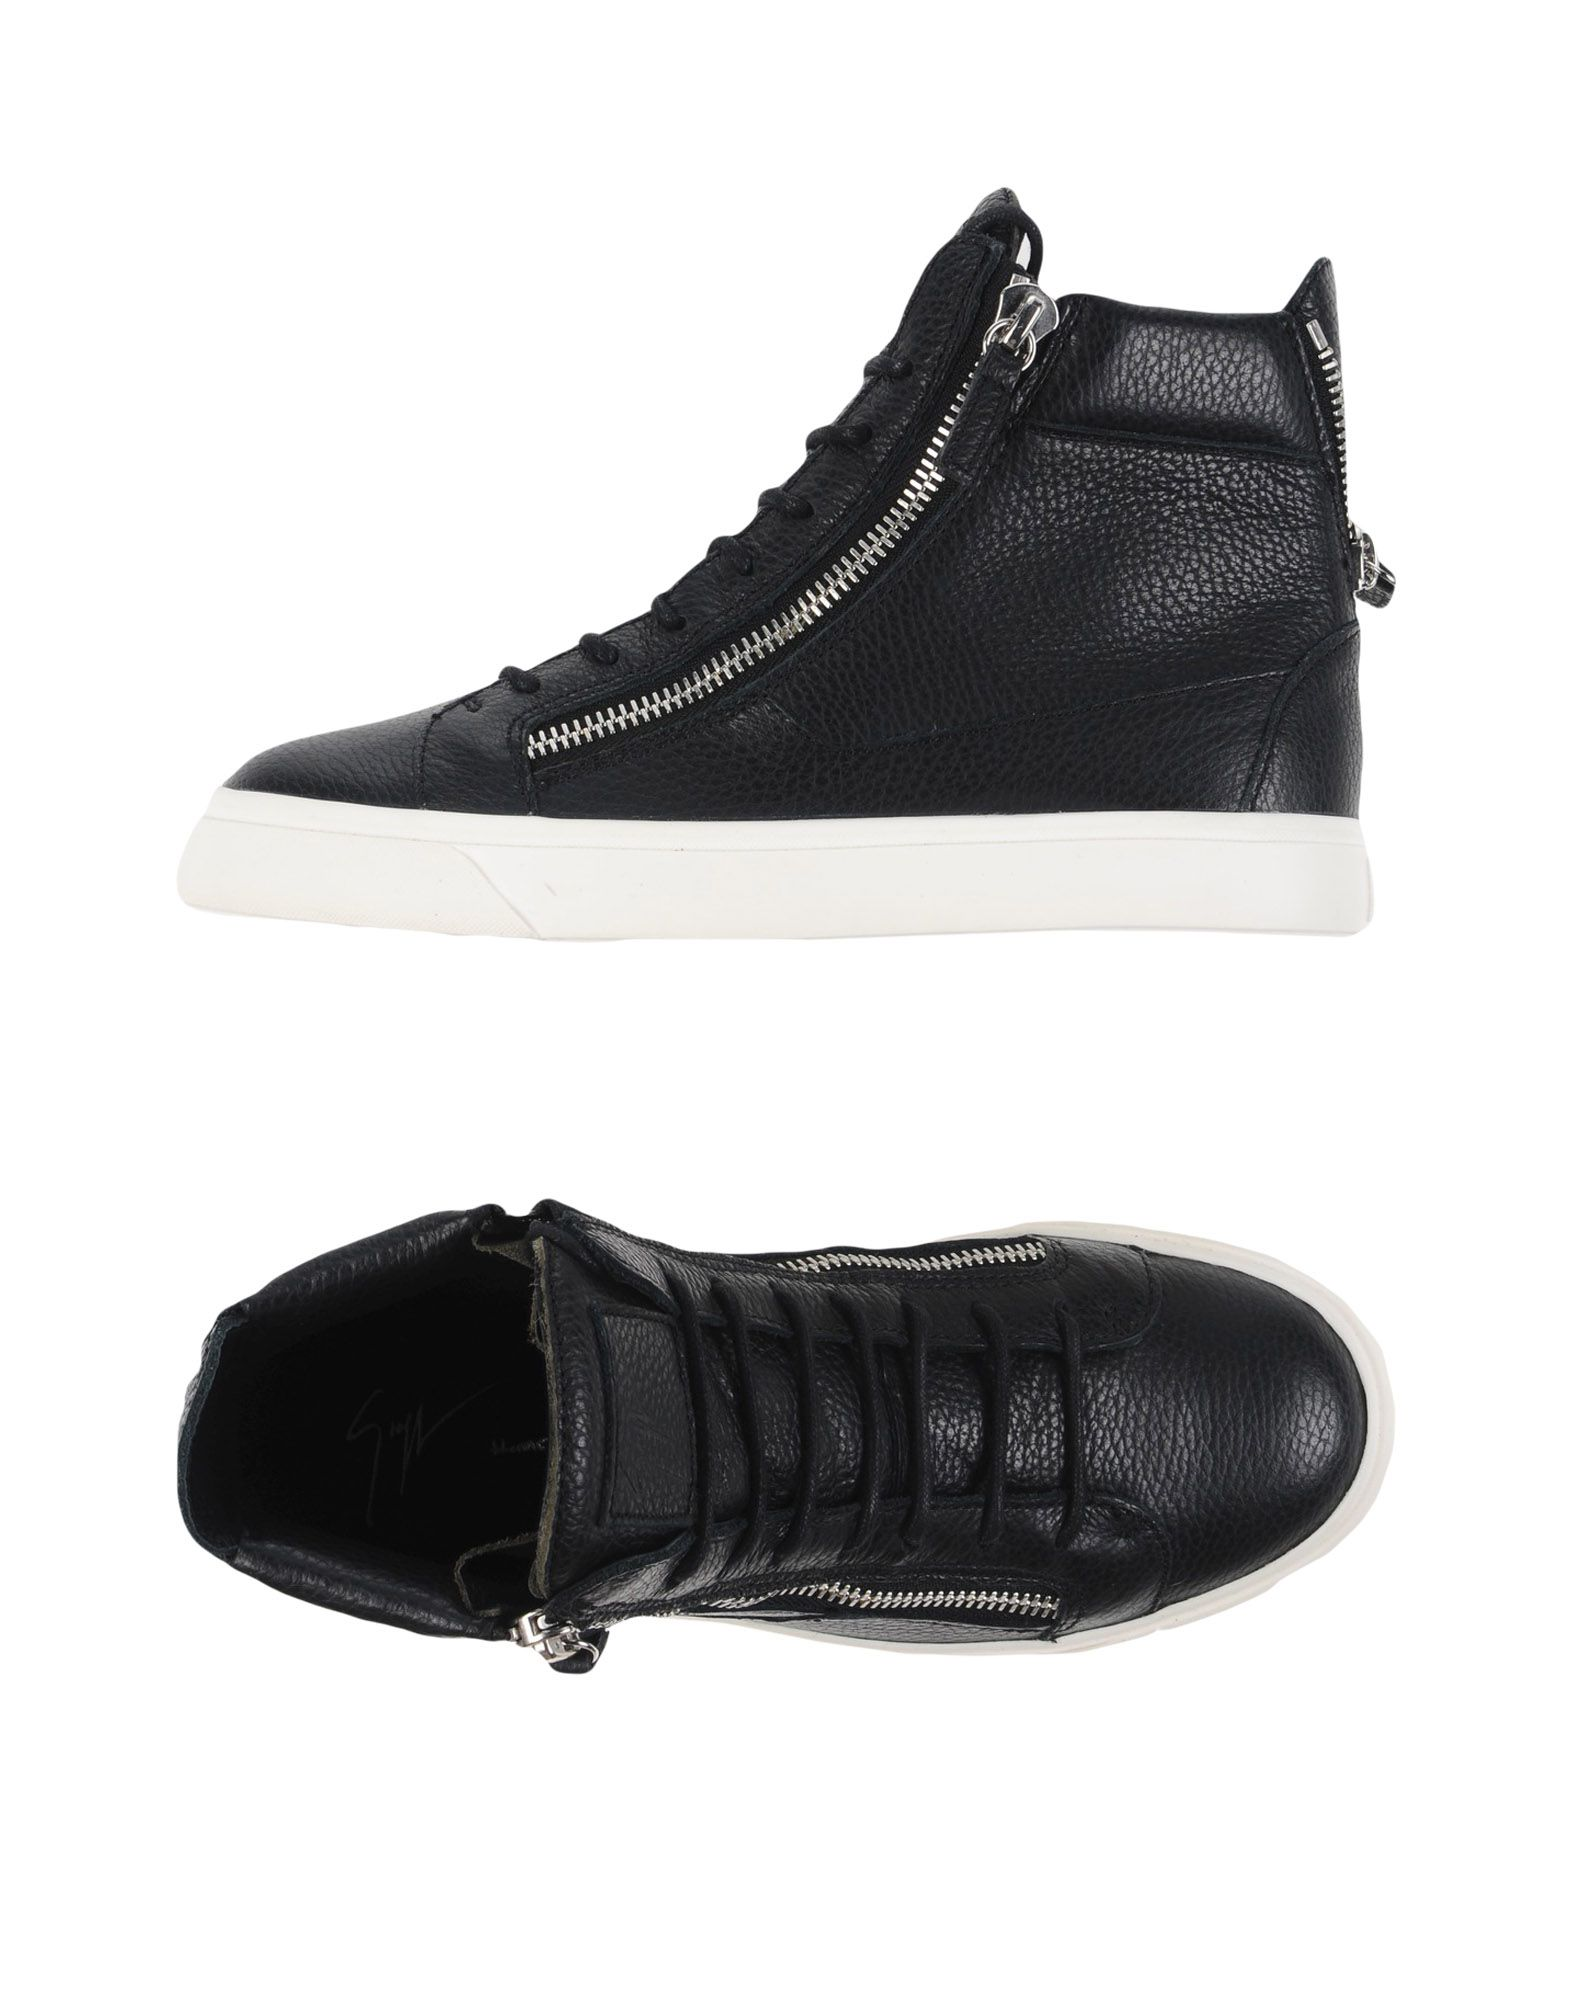 Giuseppe Zanotti Sneakers Herren Herren Sneakers  11200647RN ea68b4